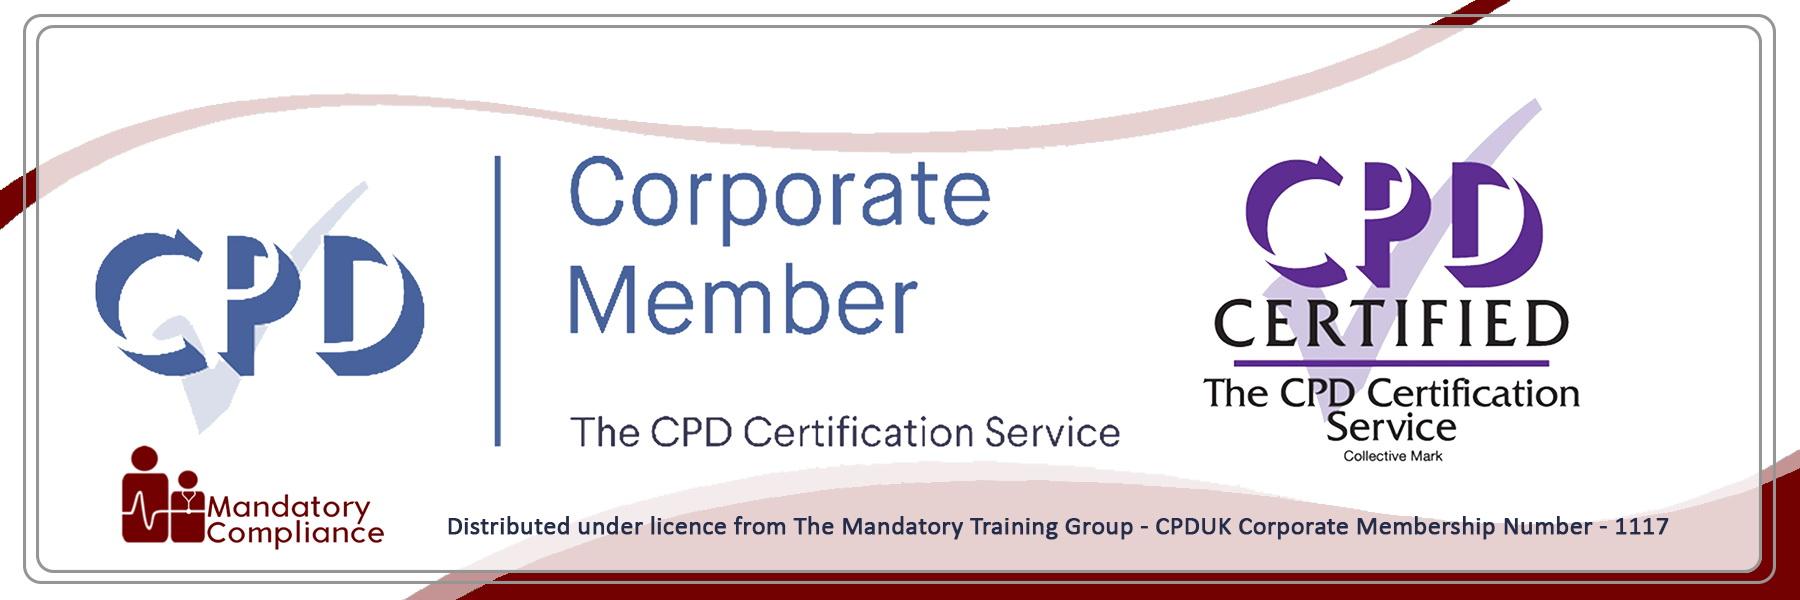 Medicines Management Courses - Online Training Courses - Mandatory Compliance UK -